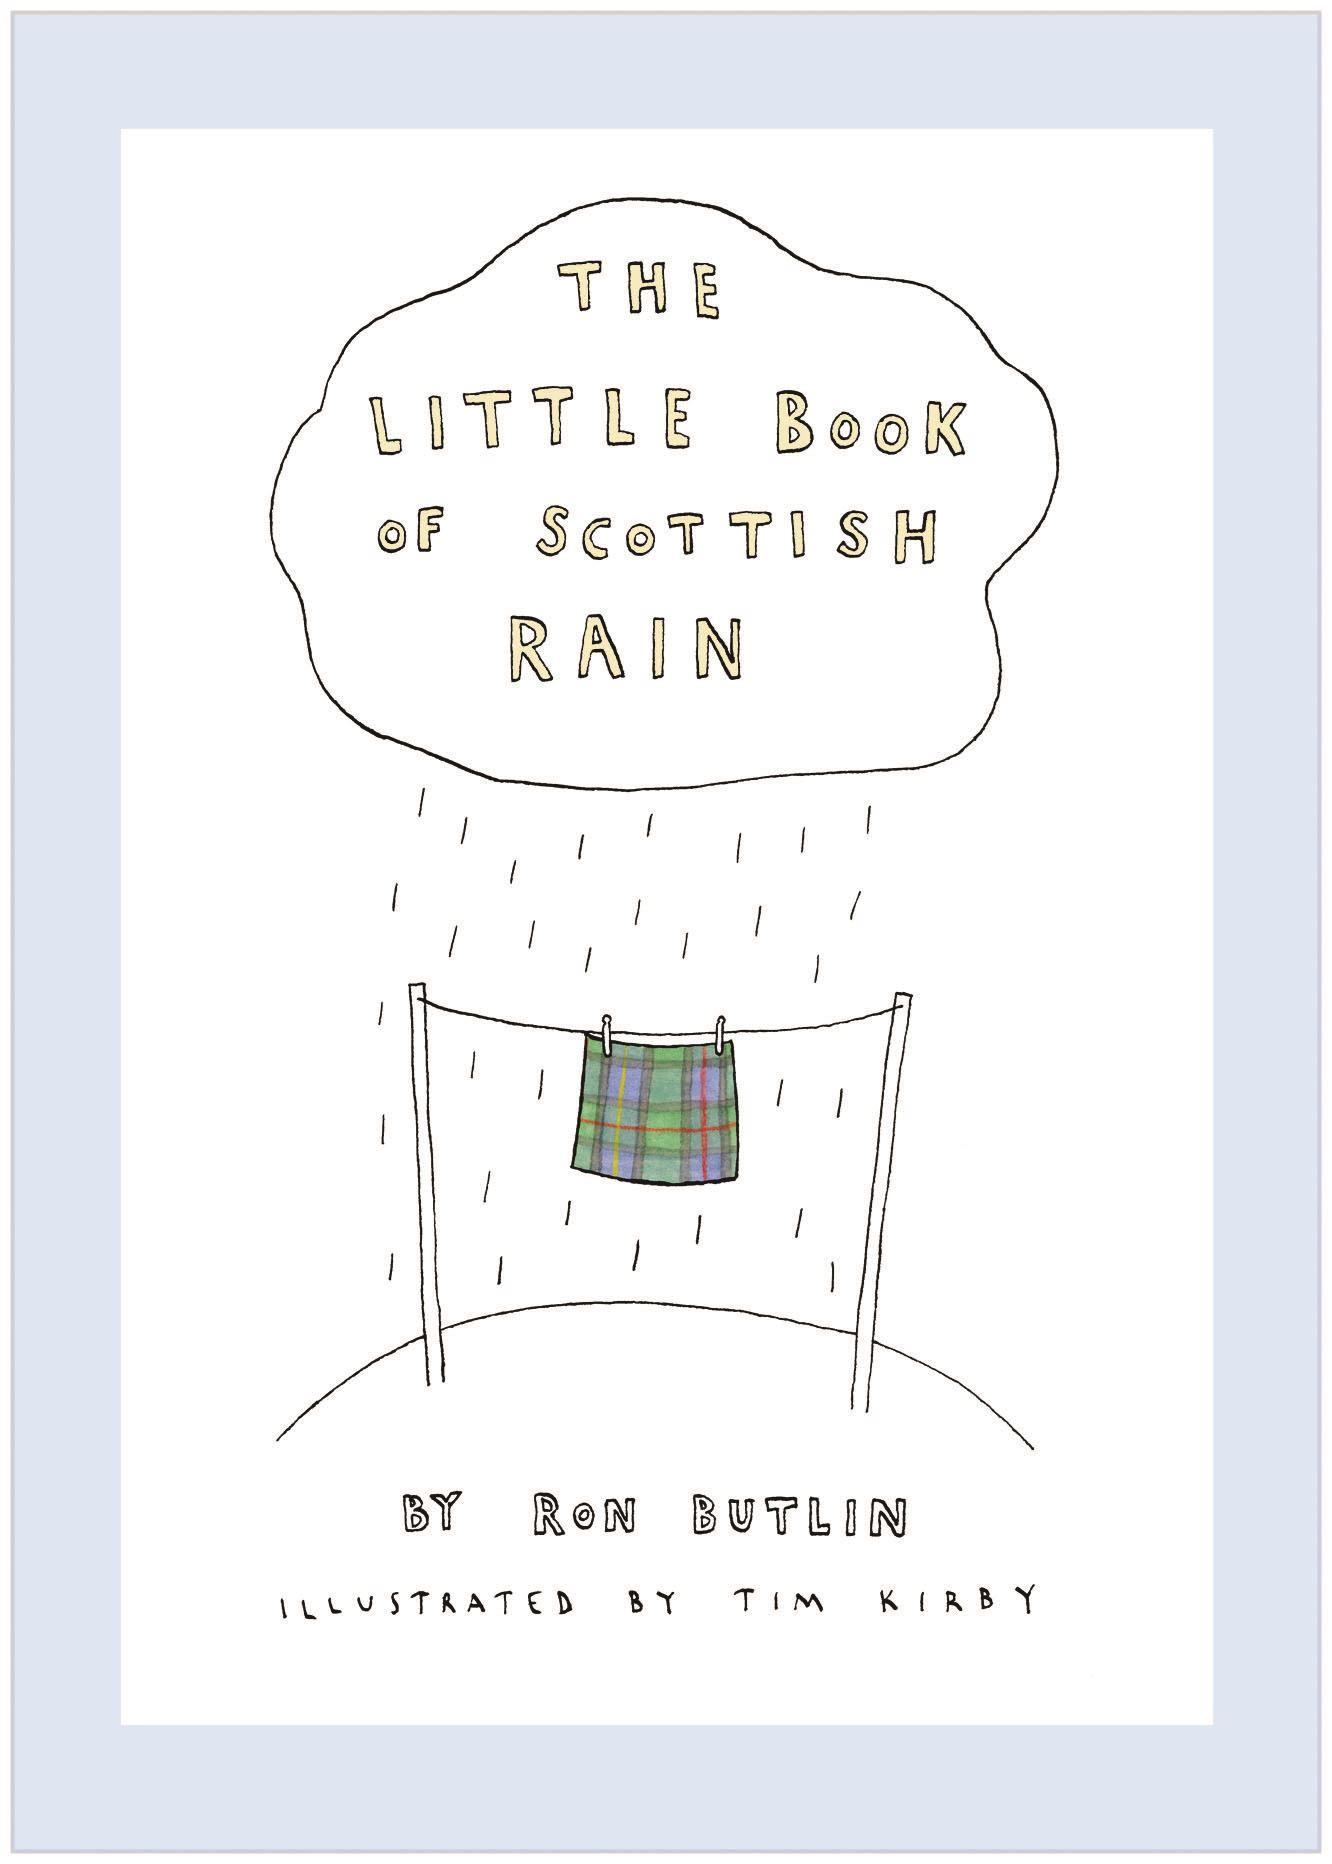 Little Book of Scottish Rain (Book)